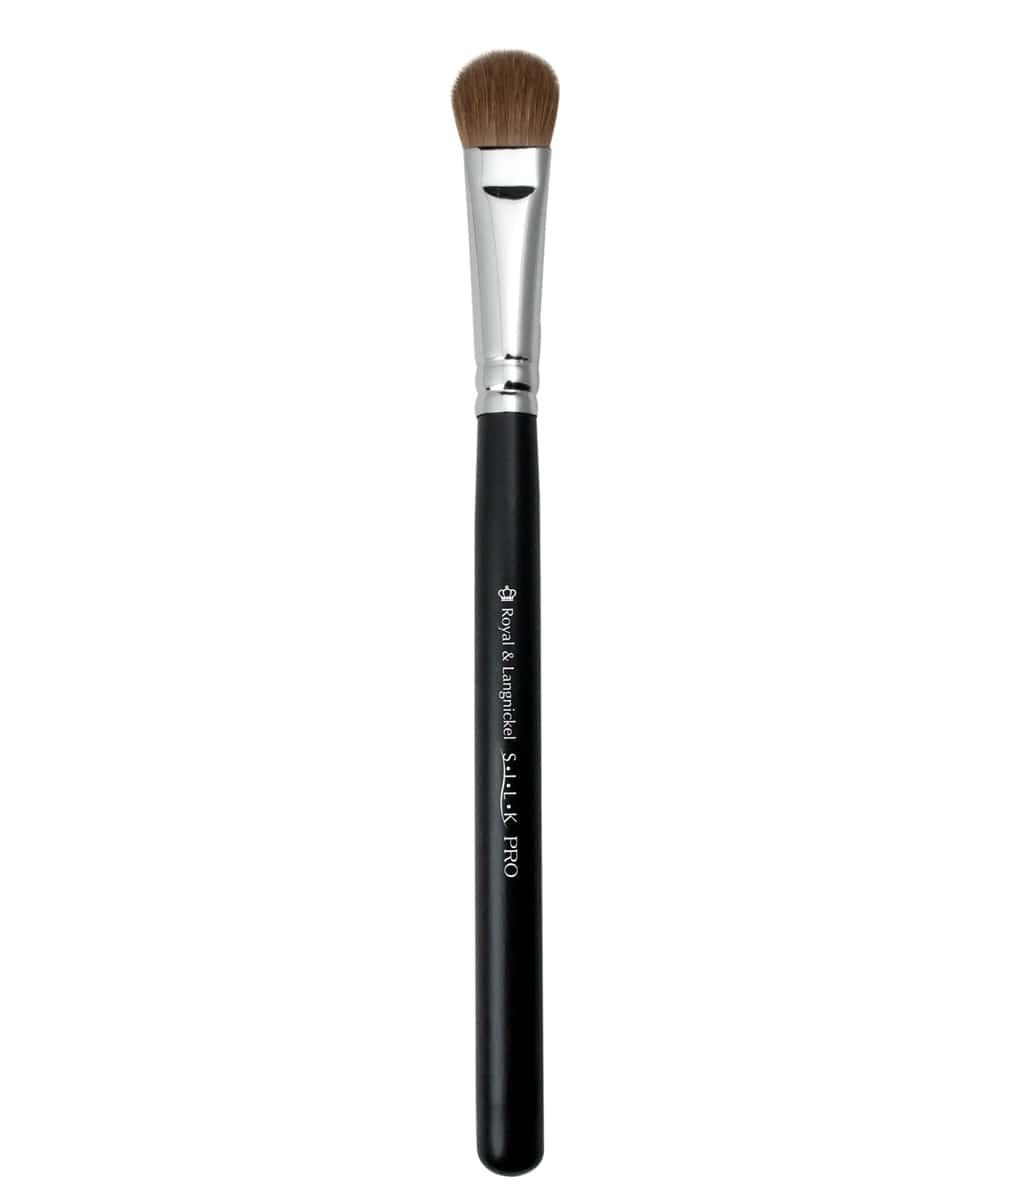 Large Eye Shader Brush